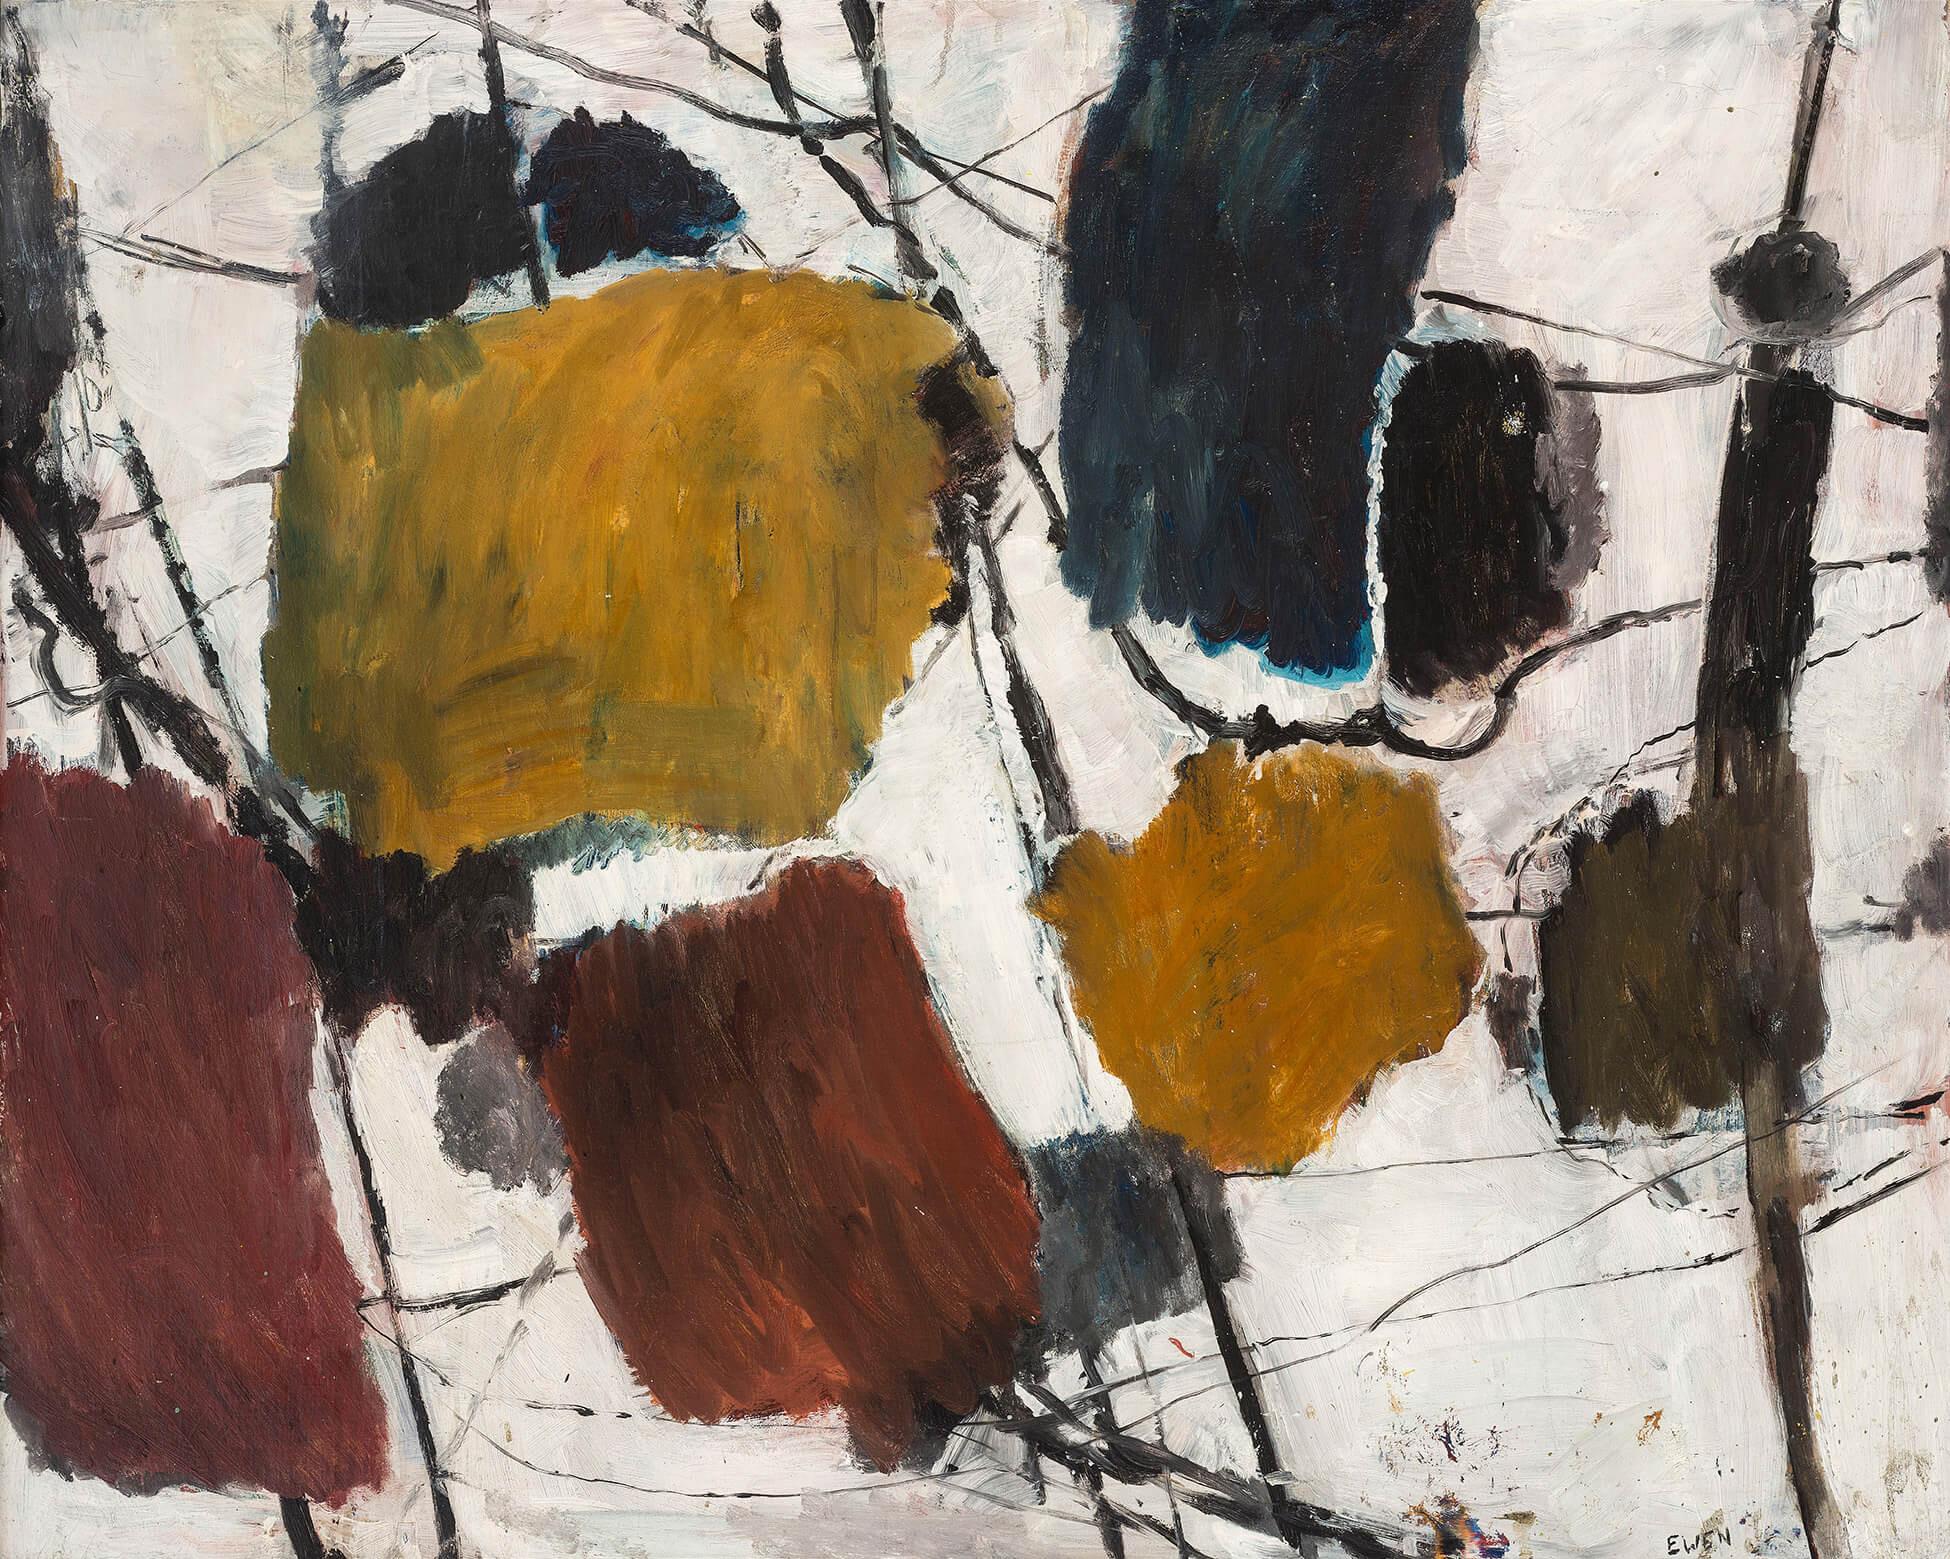 Paterson Ewen, Untitled, 1954